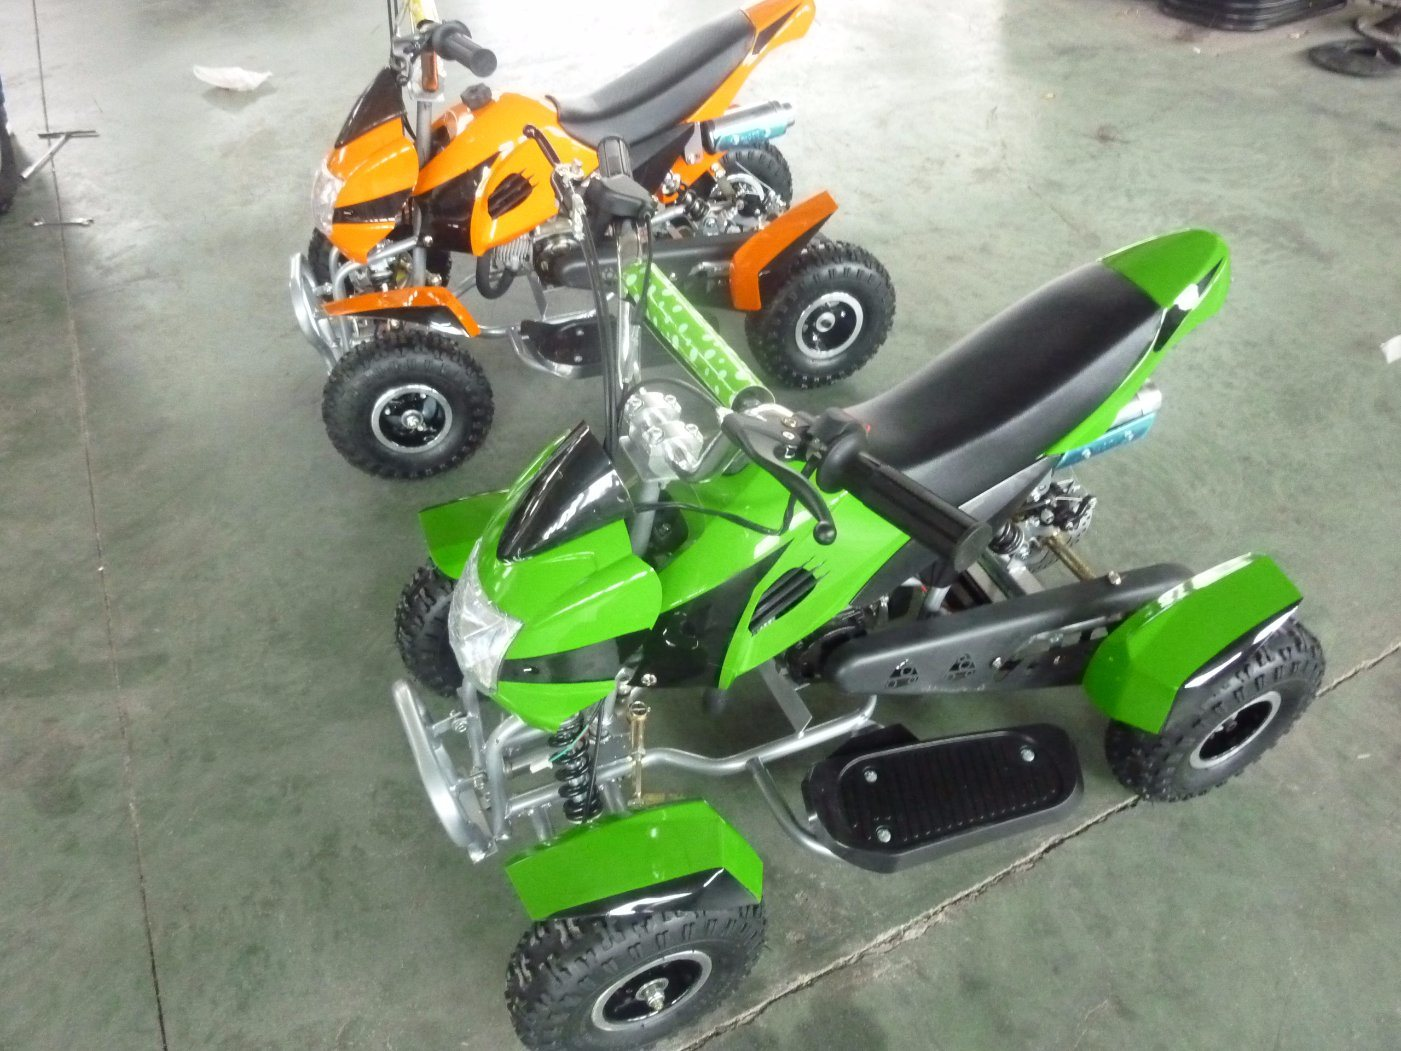 A7-007 49cc Cute Mini Kids ATV Quad with Ce Certification